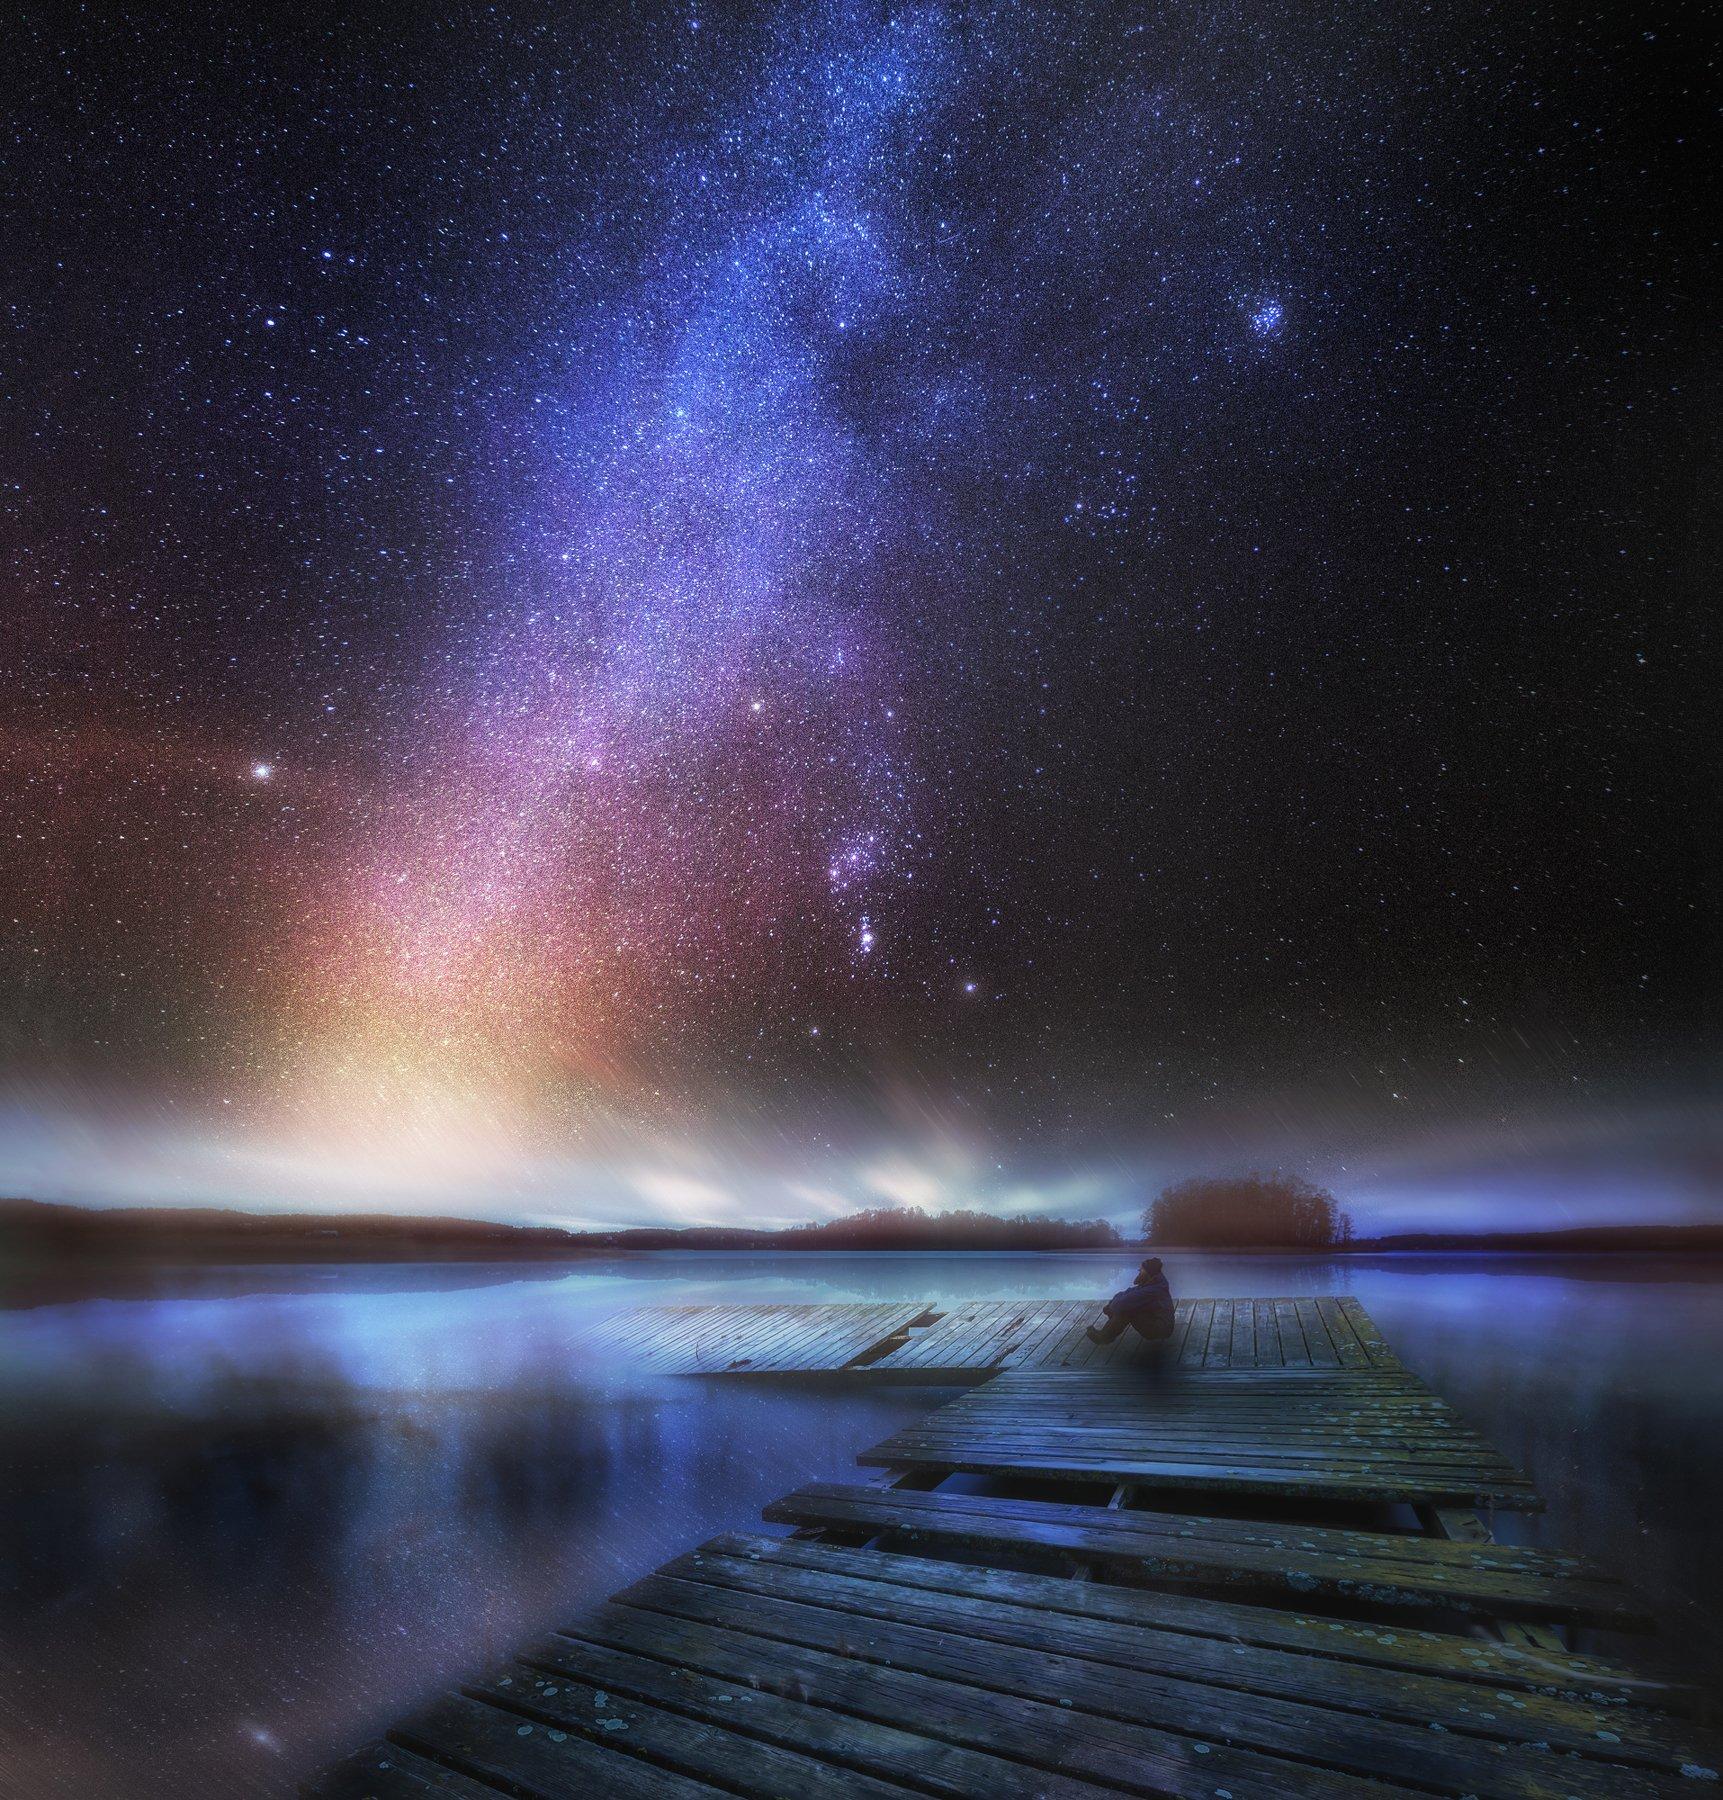 landscape, milky way, lake, poland, olsztyn, man, silhouette, jetty, destroyed, long exposure, starry, stars, orion,, Milosz_Guzowski